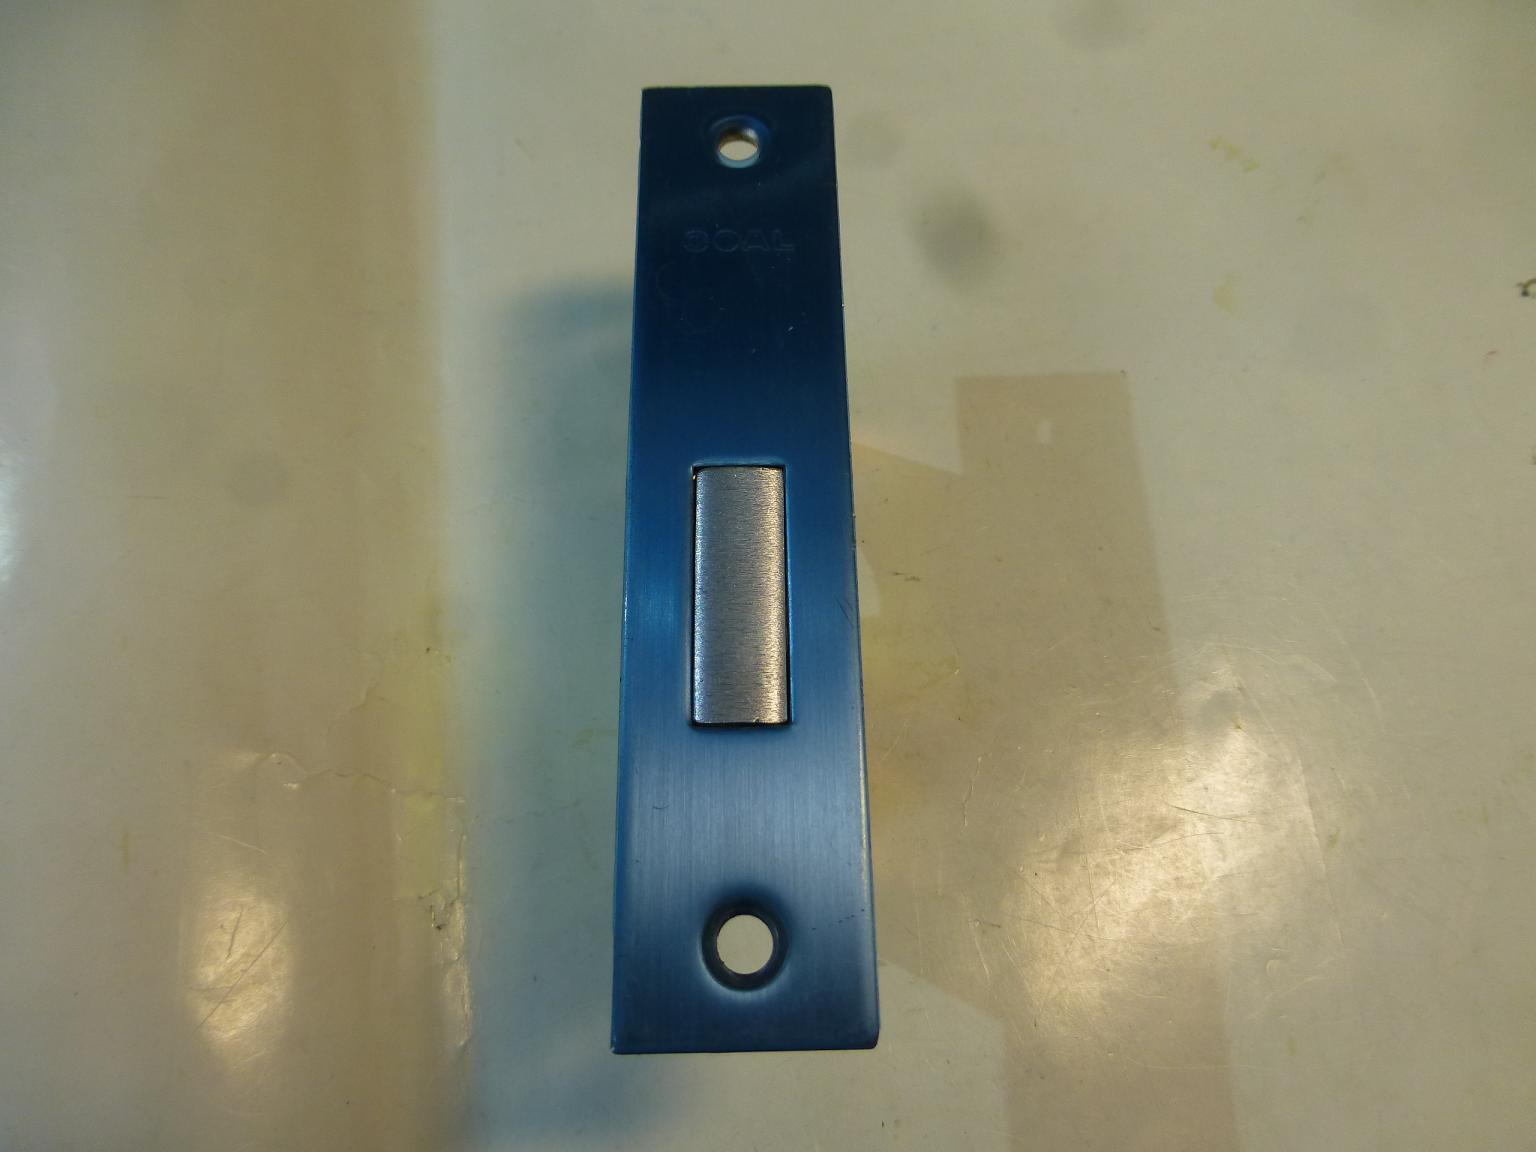 F25x120 GOAL 錠ケース 1503-6 33~43mm B 本日の目玉 保証 S32mm扉厚